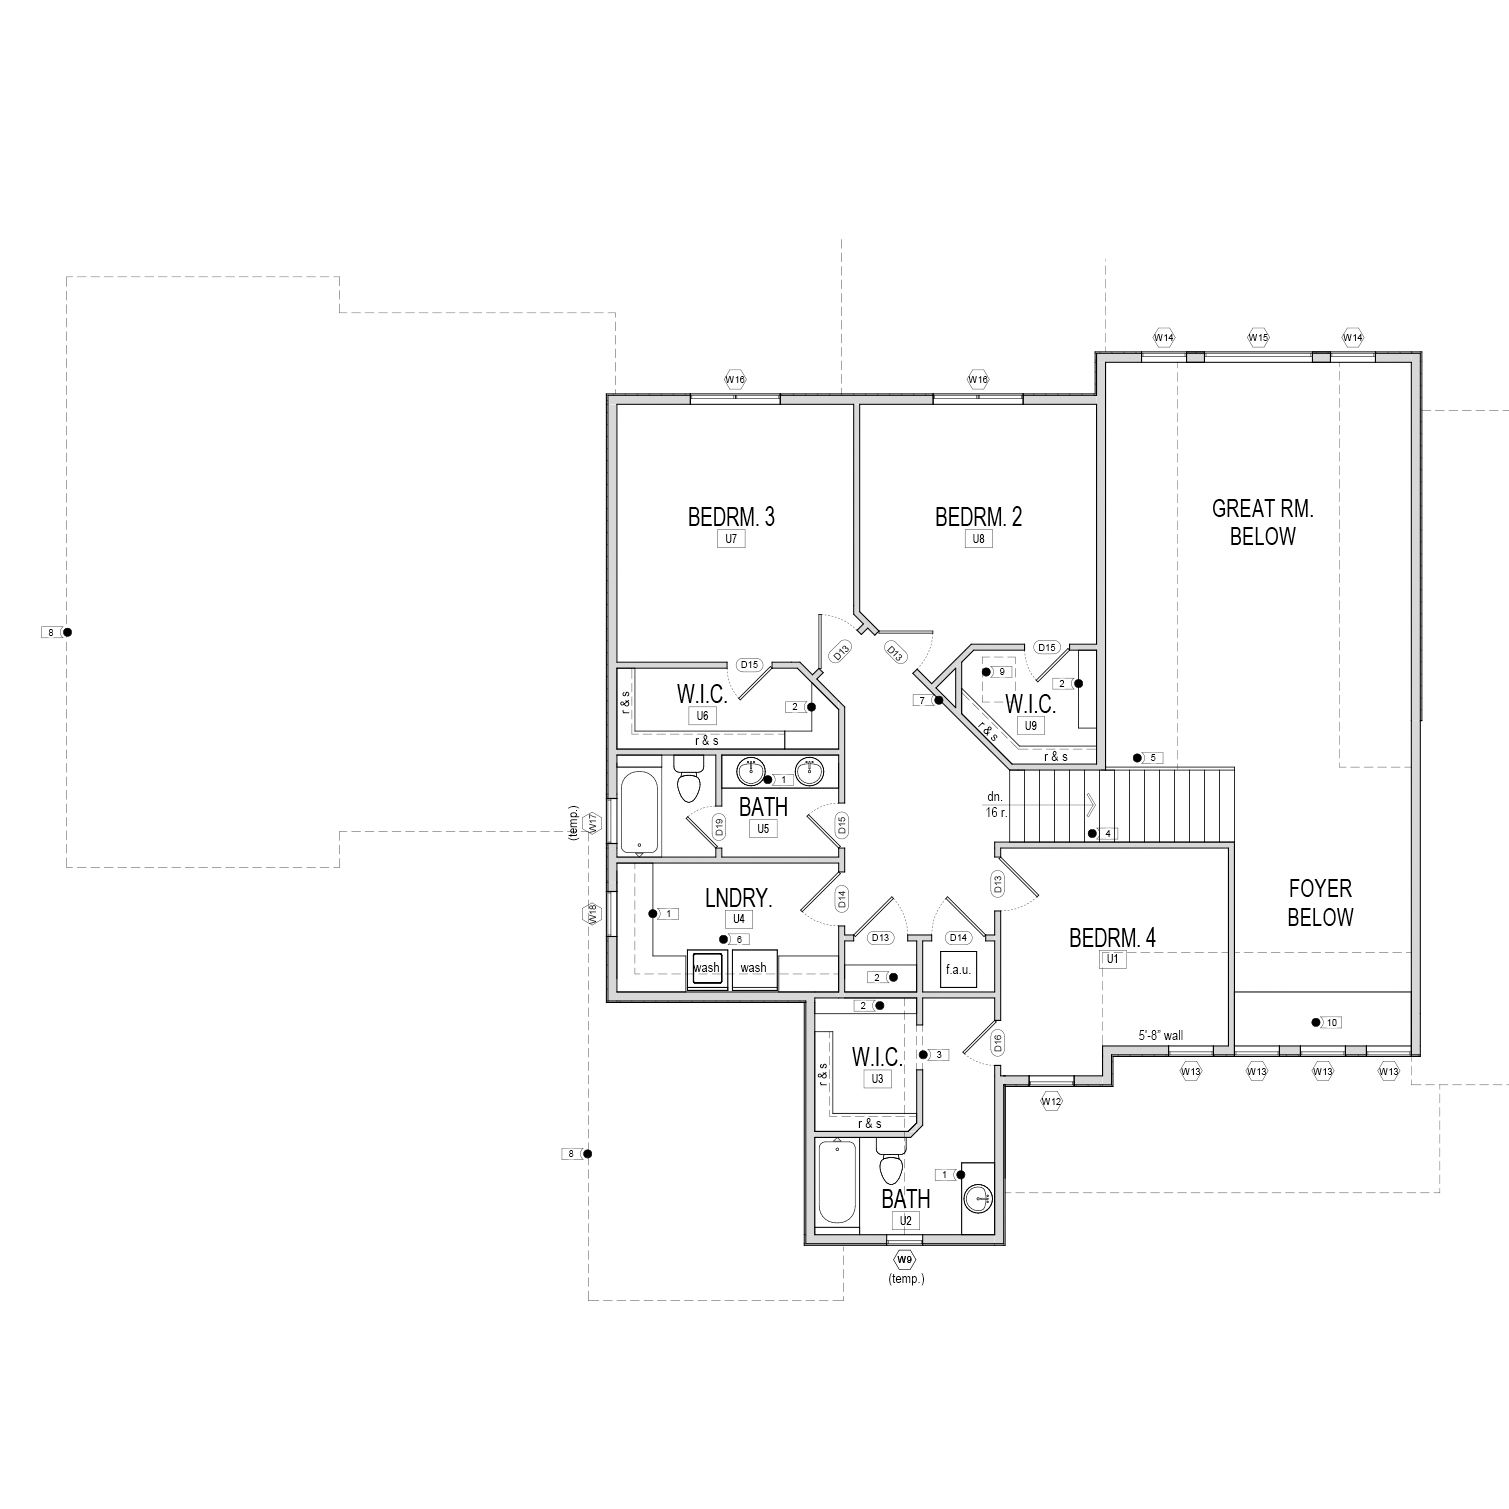 plans_upstairs2.jpg